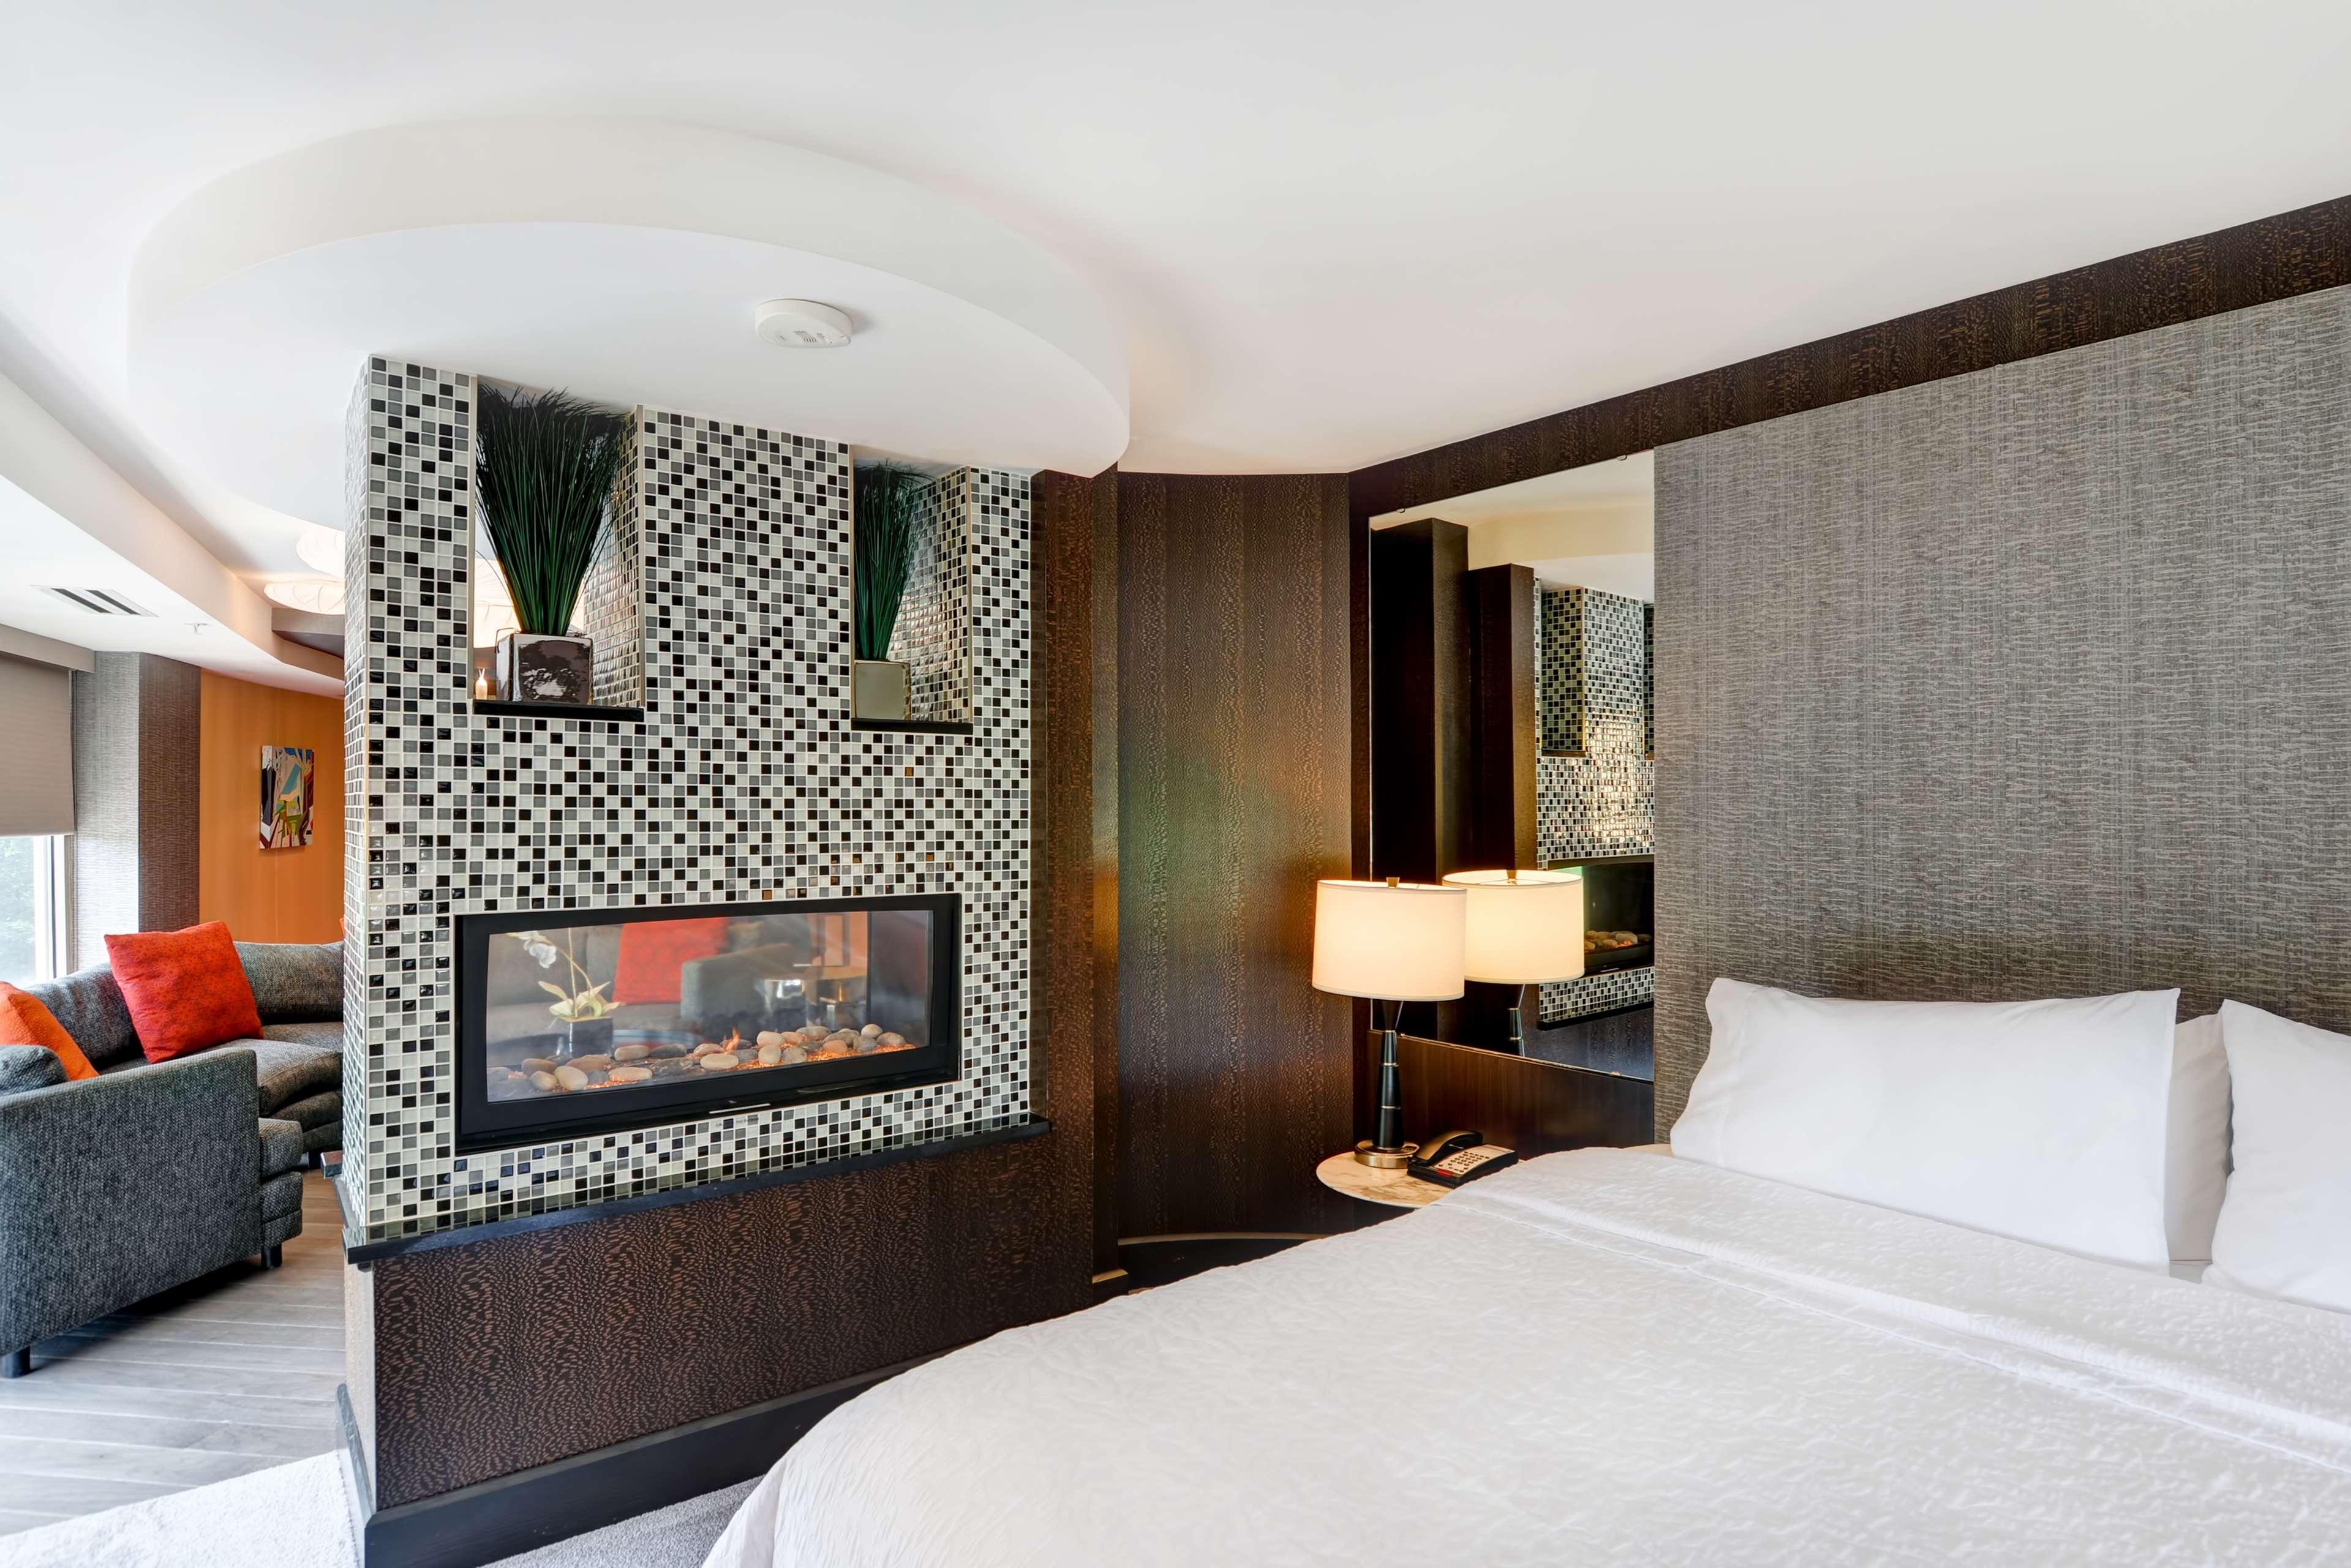 Hampton Inn & Suites Raleigh/Crabtree Valley image 23